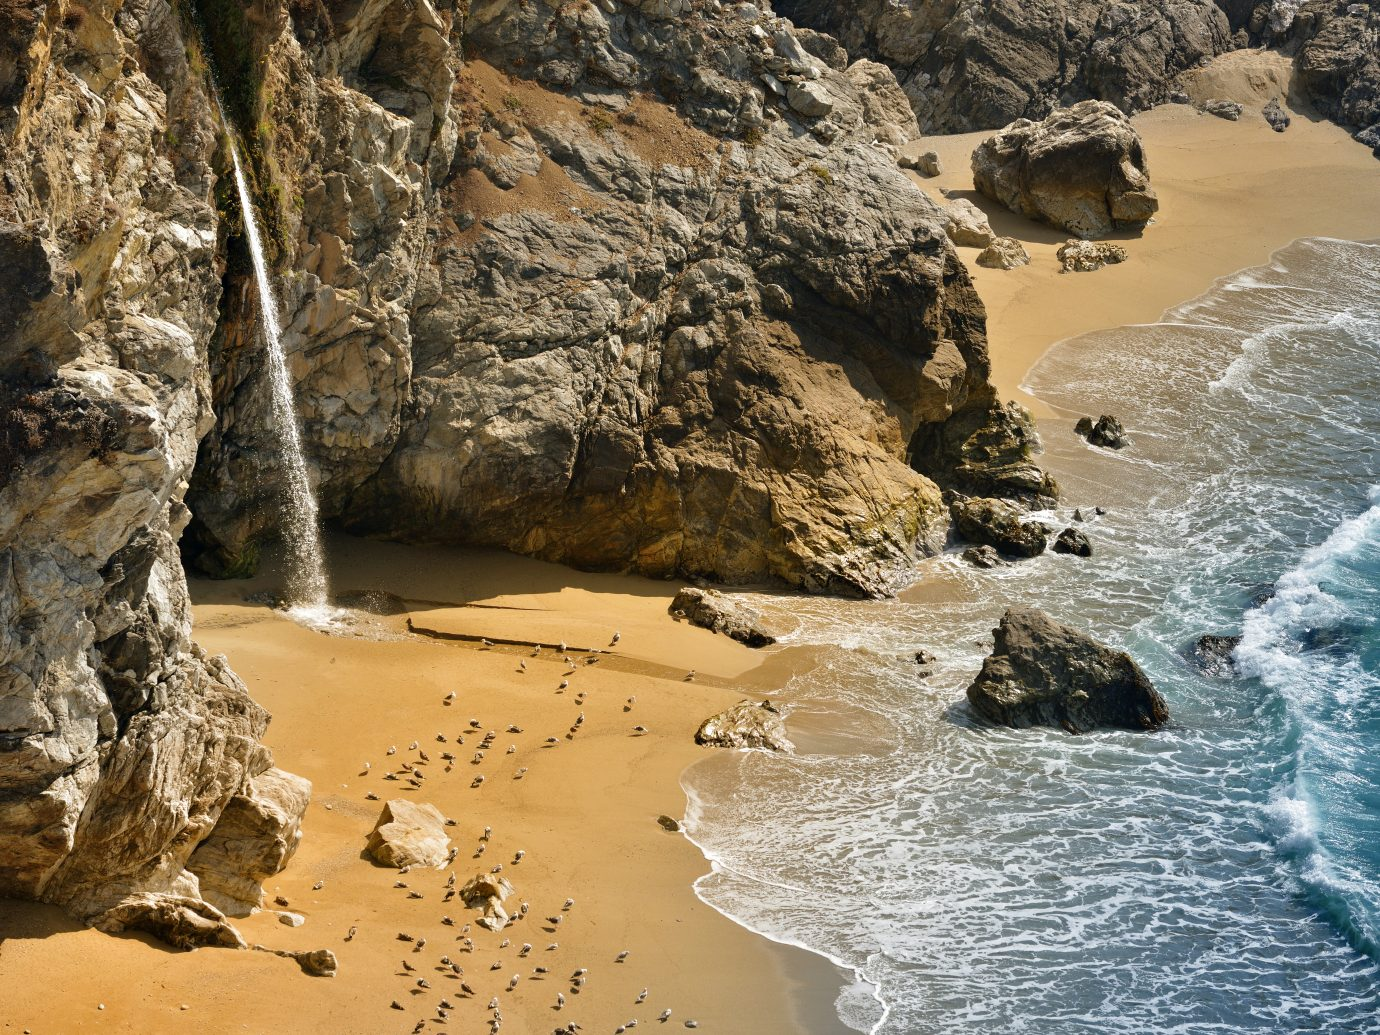 Pfeiffer Beach on Pacific Coast Highway